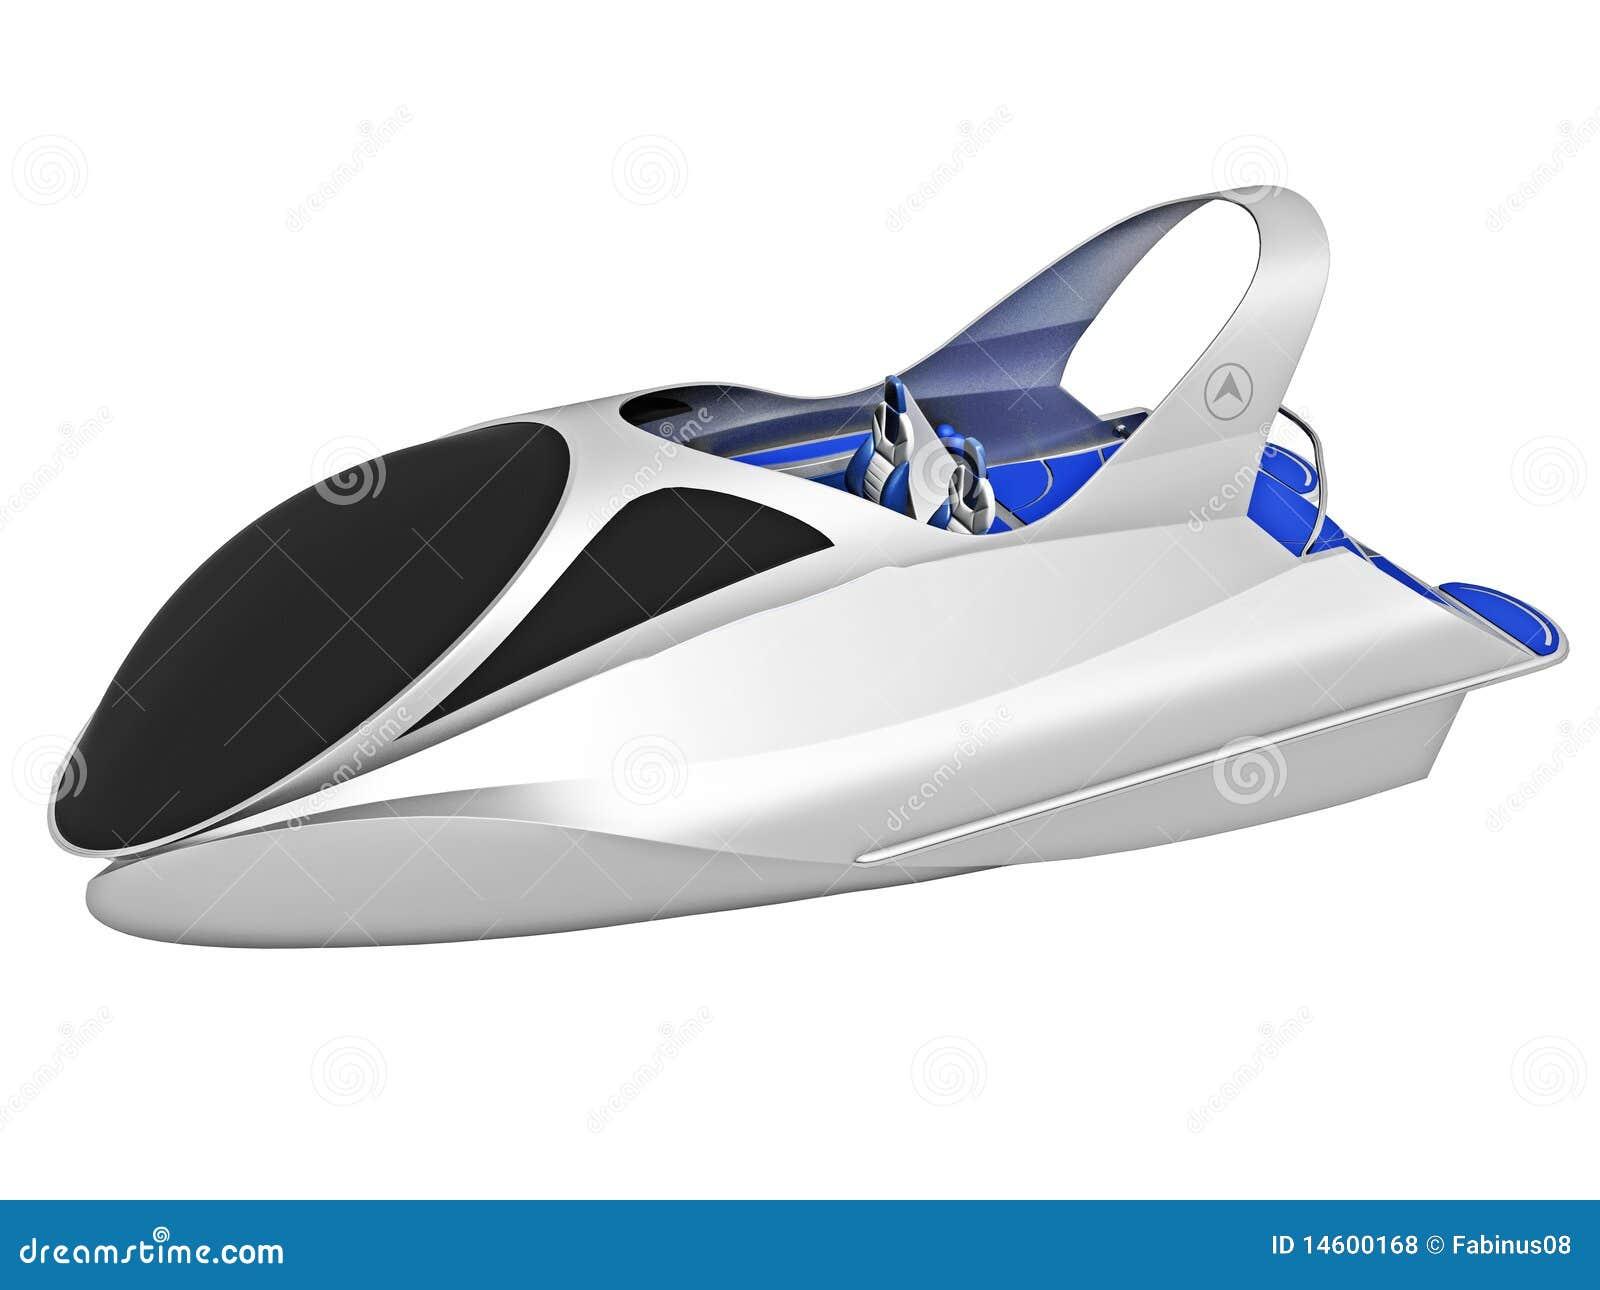 Royalty Free Stock Photos: Futuristic Boat Illustration. Image ...